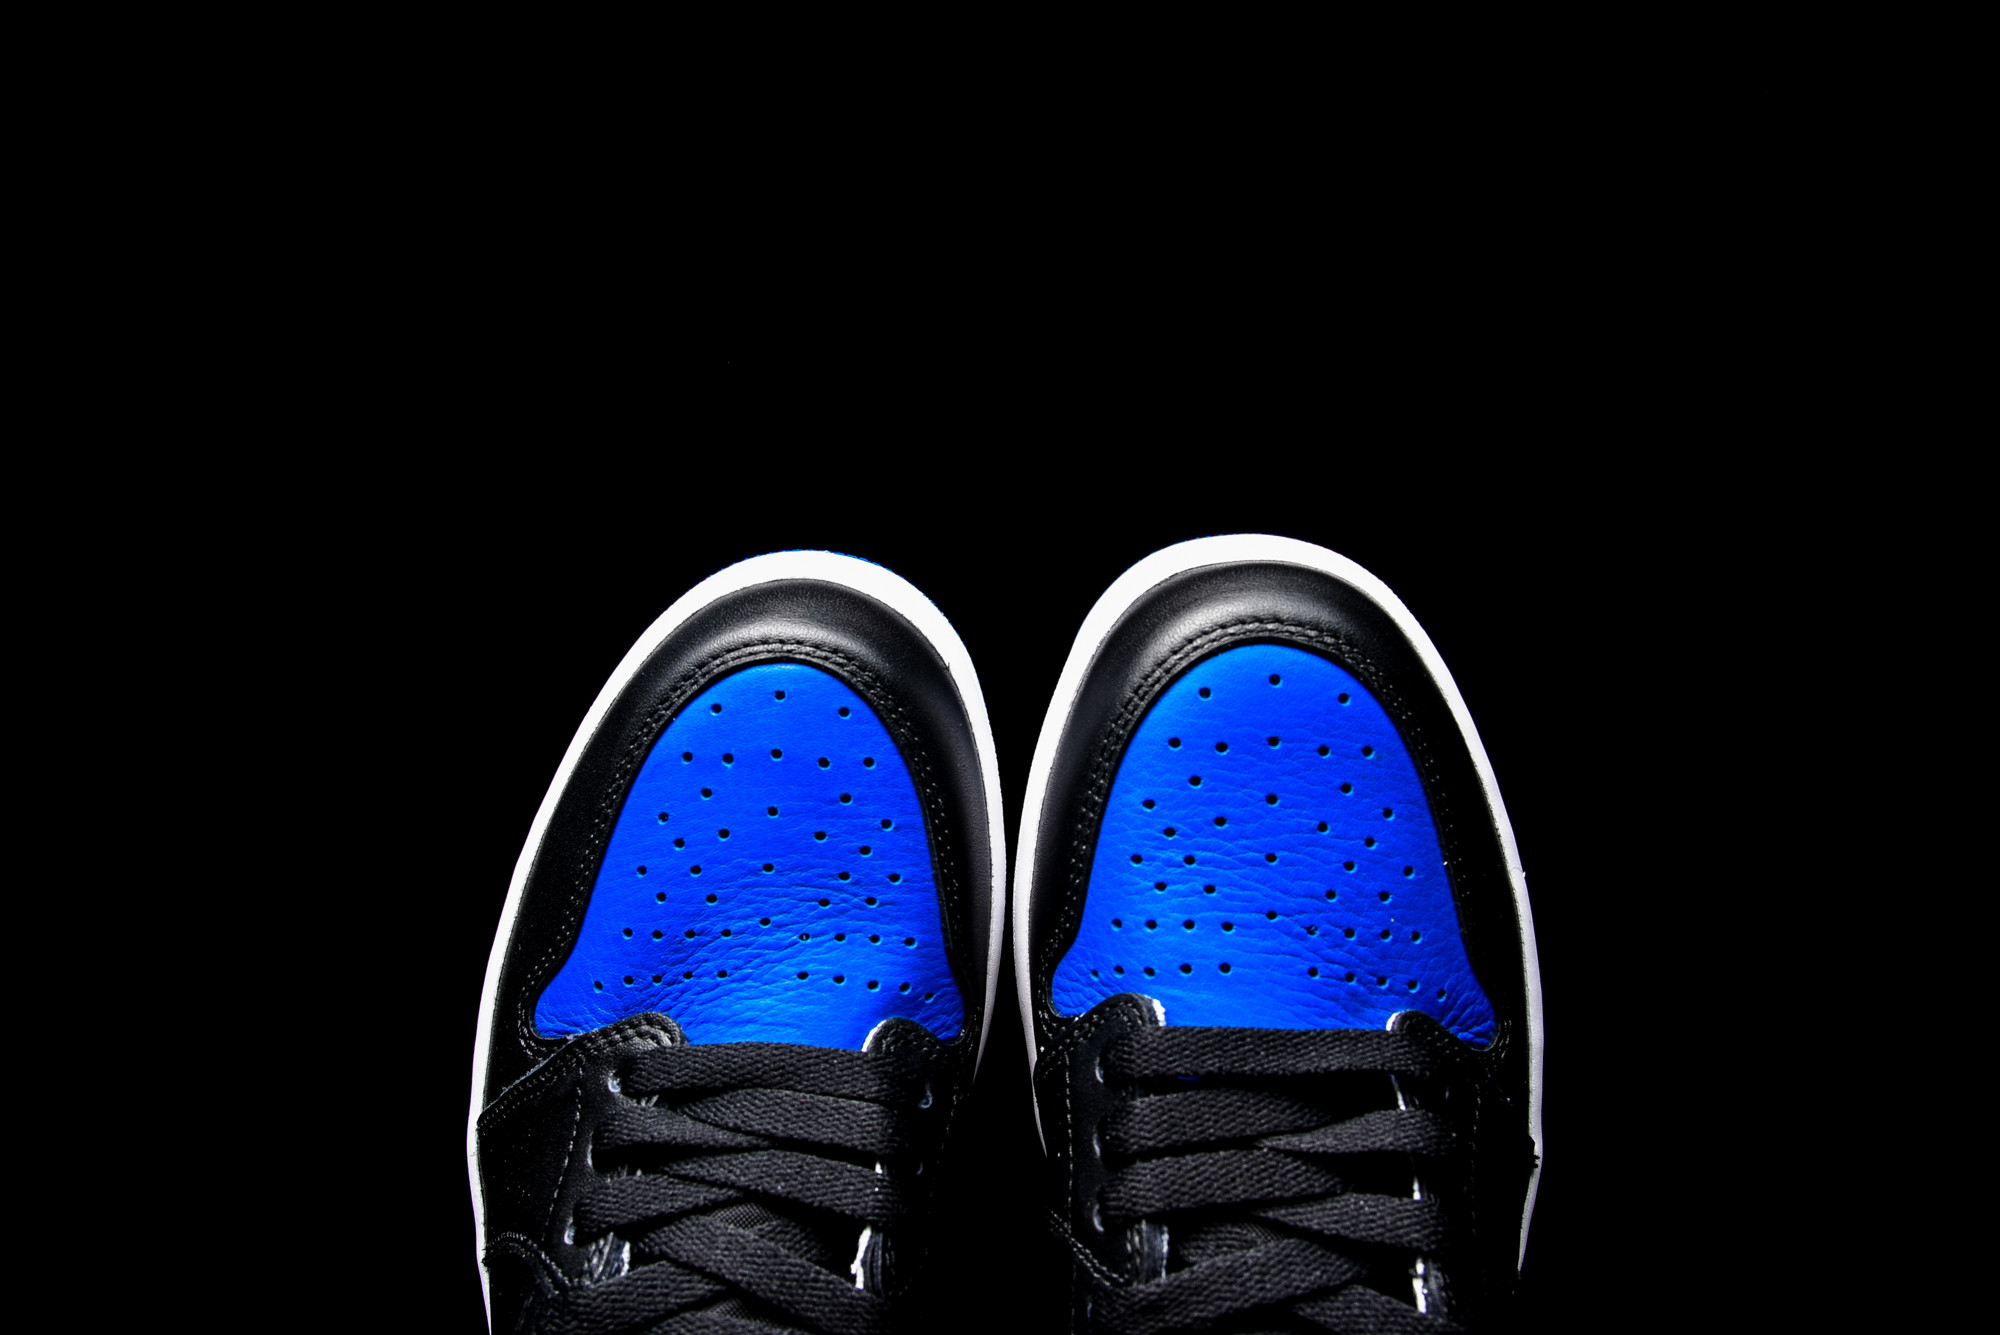 Air Jordan 1 Retro High OG Royals | Release info